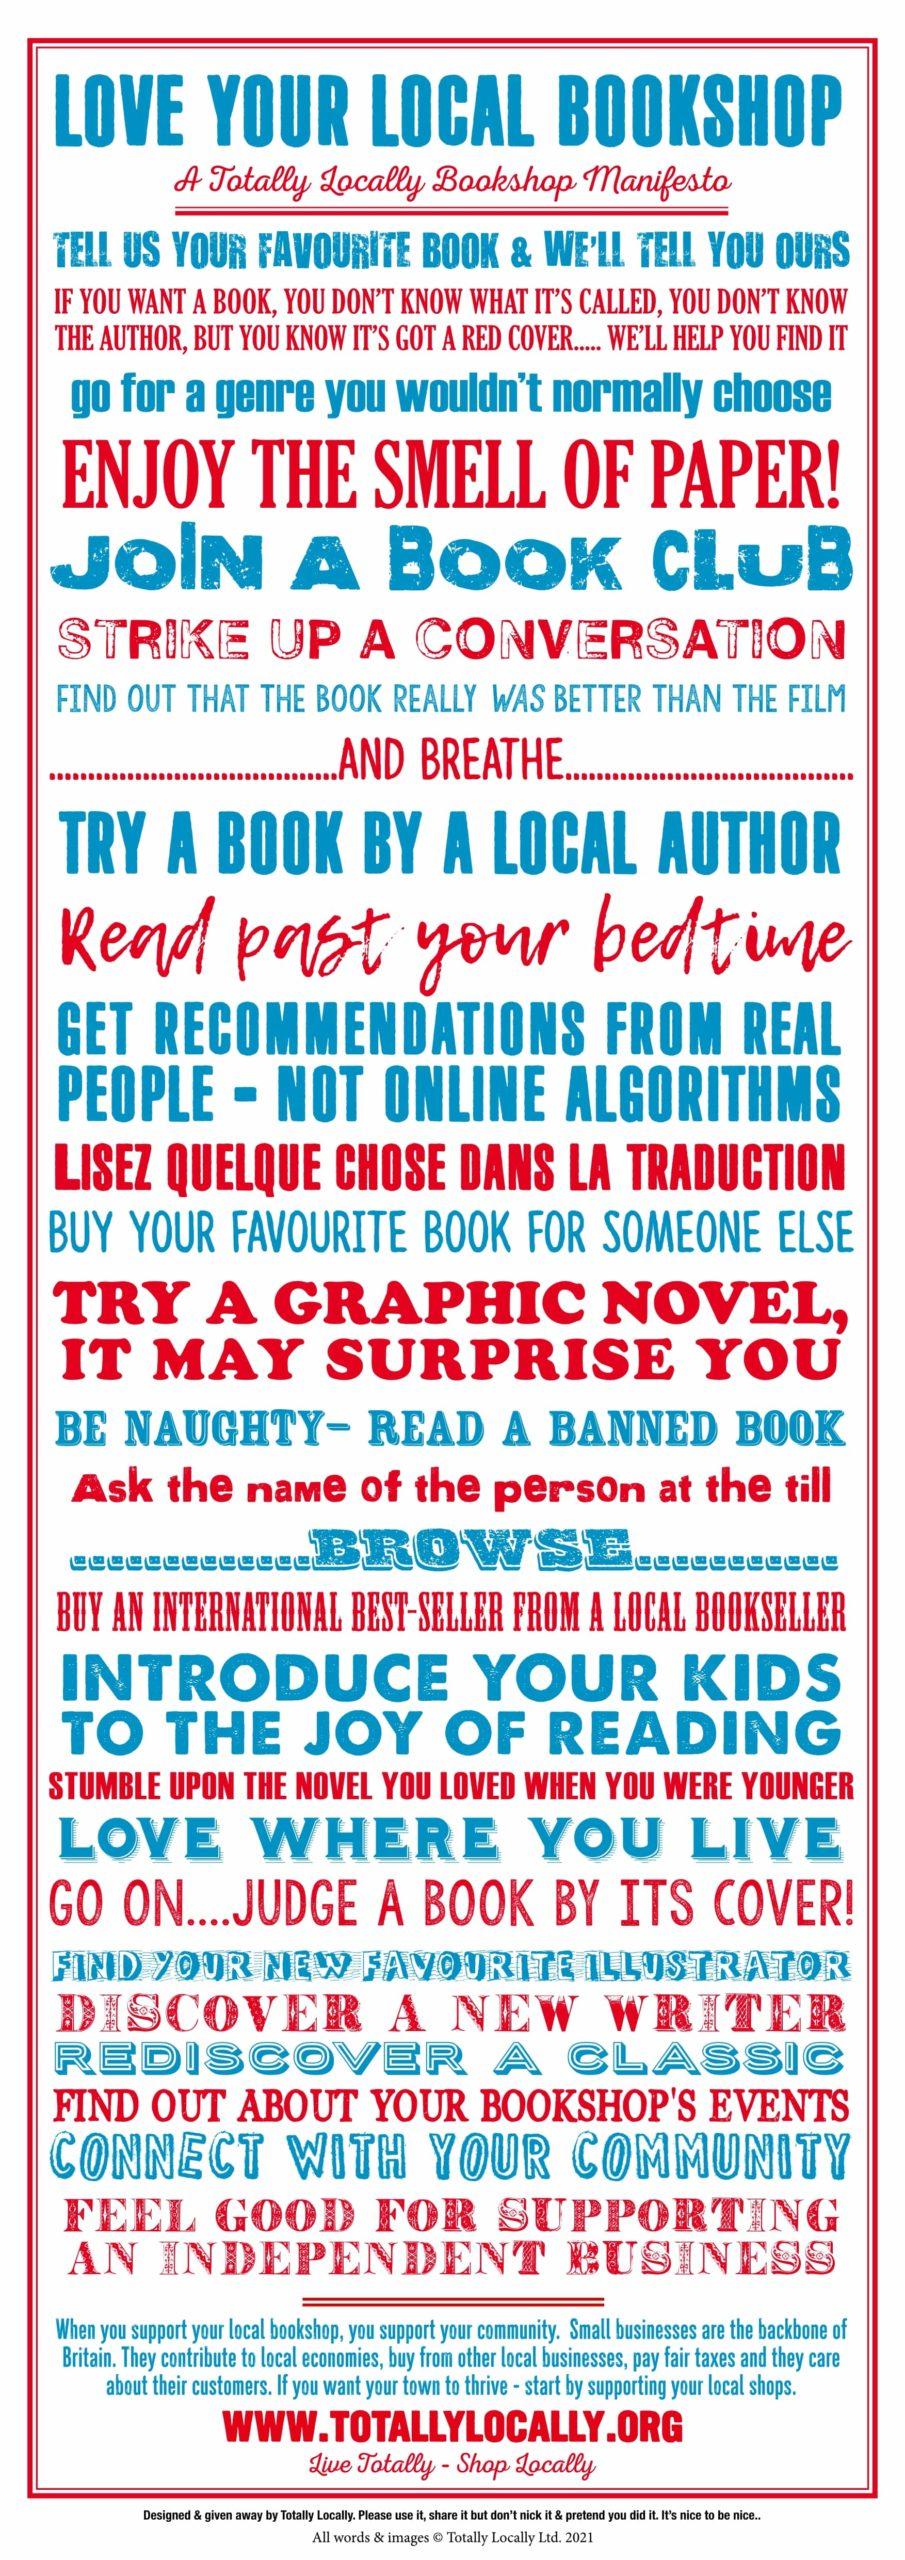 Totally Locally Bookshop Manifesto